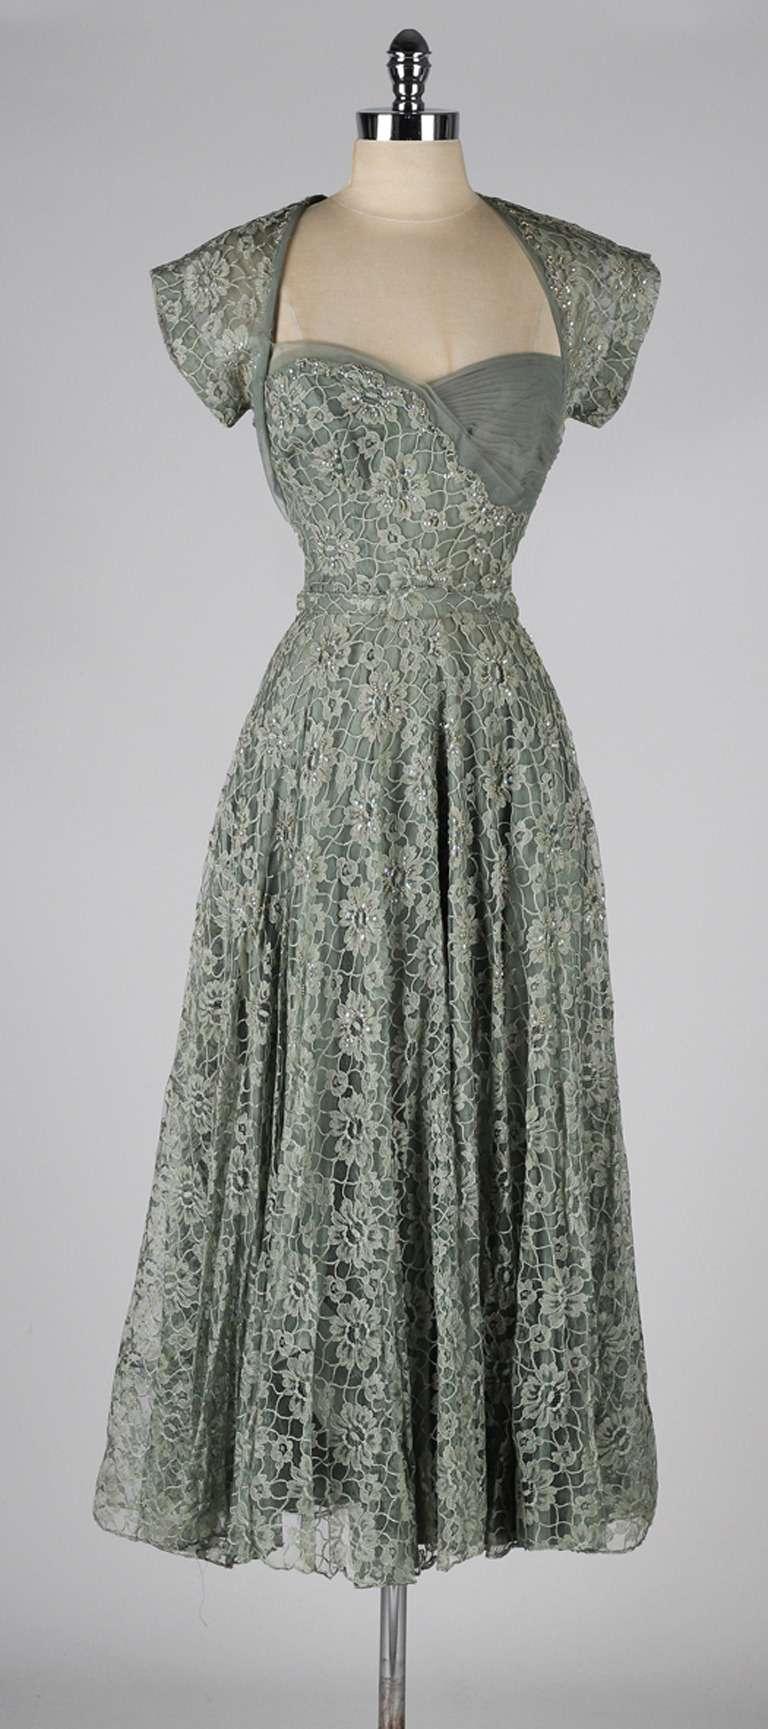 Vintage 1940s Sage Green Lace Cocktail Dress At 1stdibs